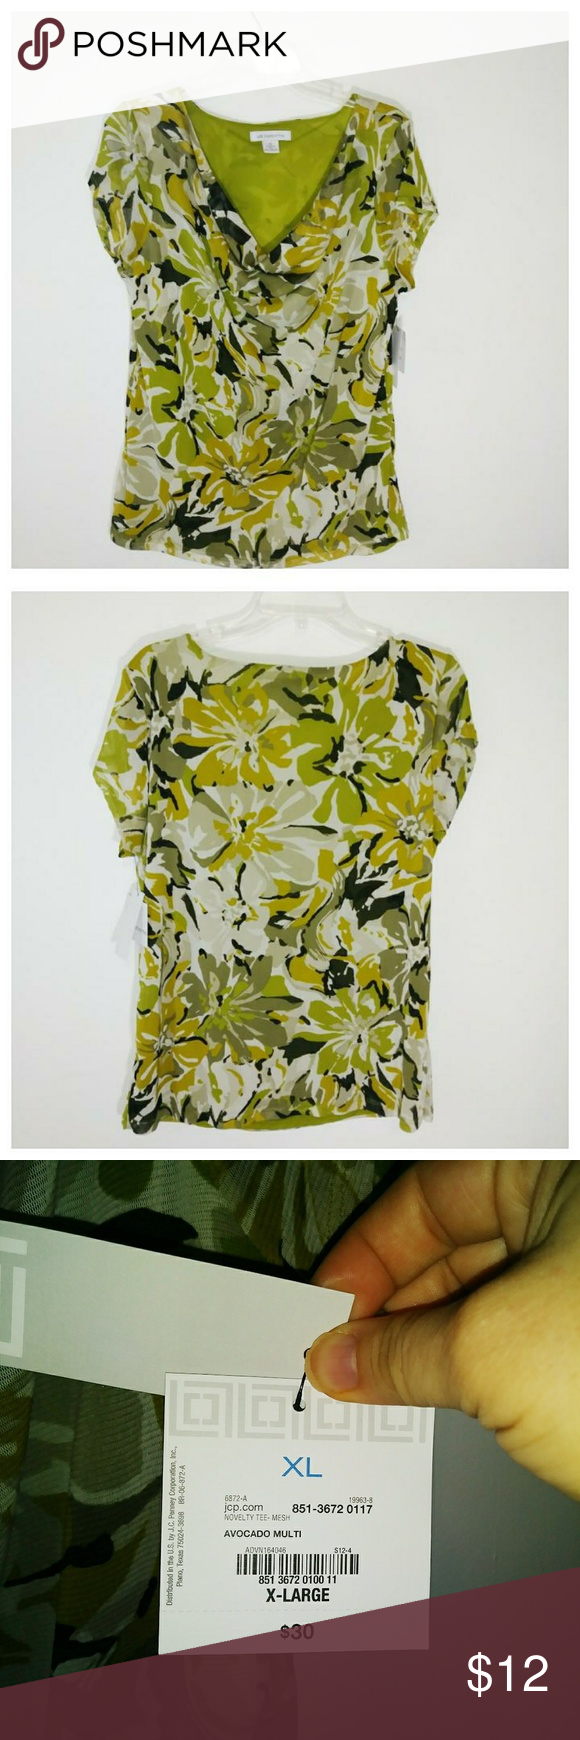 4f70b636a77ac Liz Claiborne Drape Neck Blouse-NWT (P57) New drape neck lined top by Liz  Claiborne in shades of cream